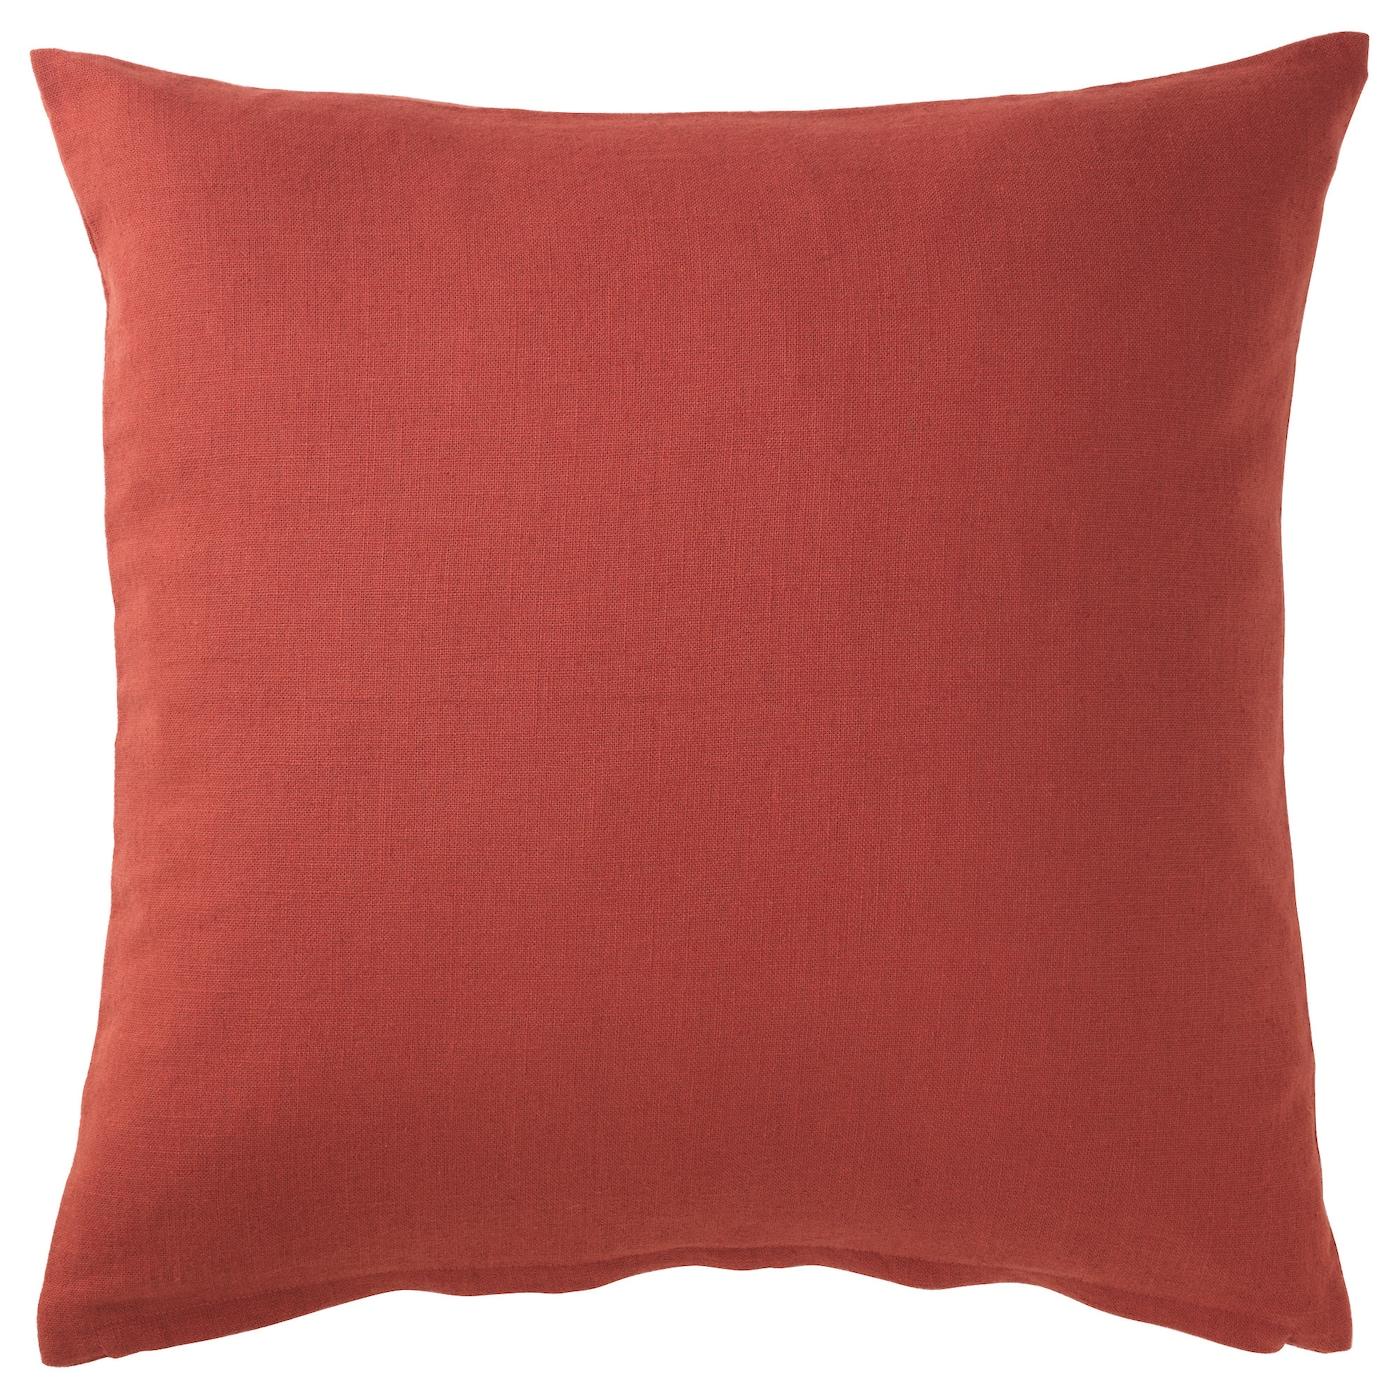 VIGDIS Funda de cojín, naranja rojizo IKEA